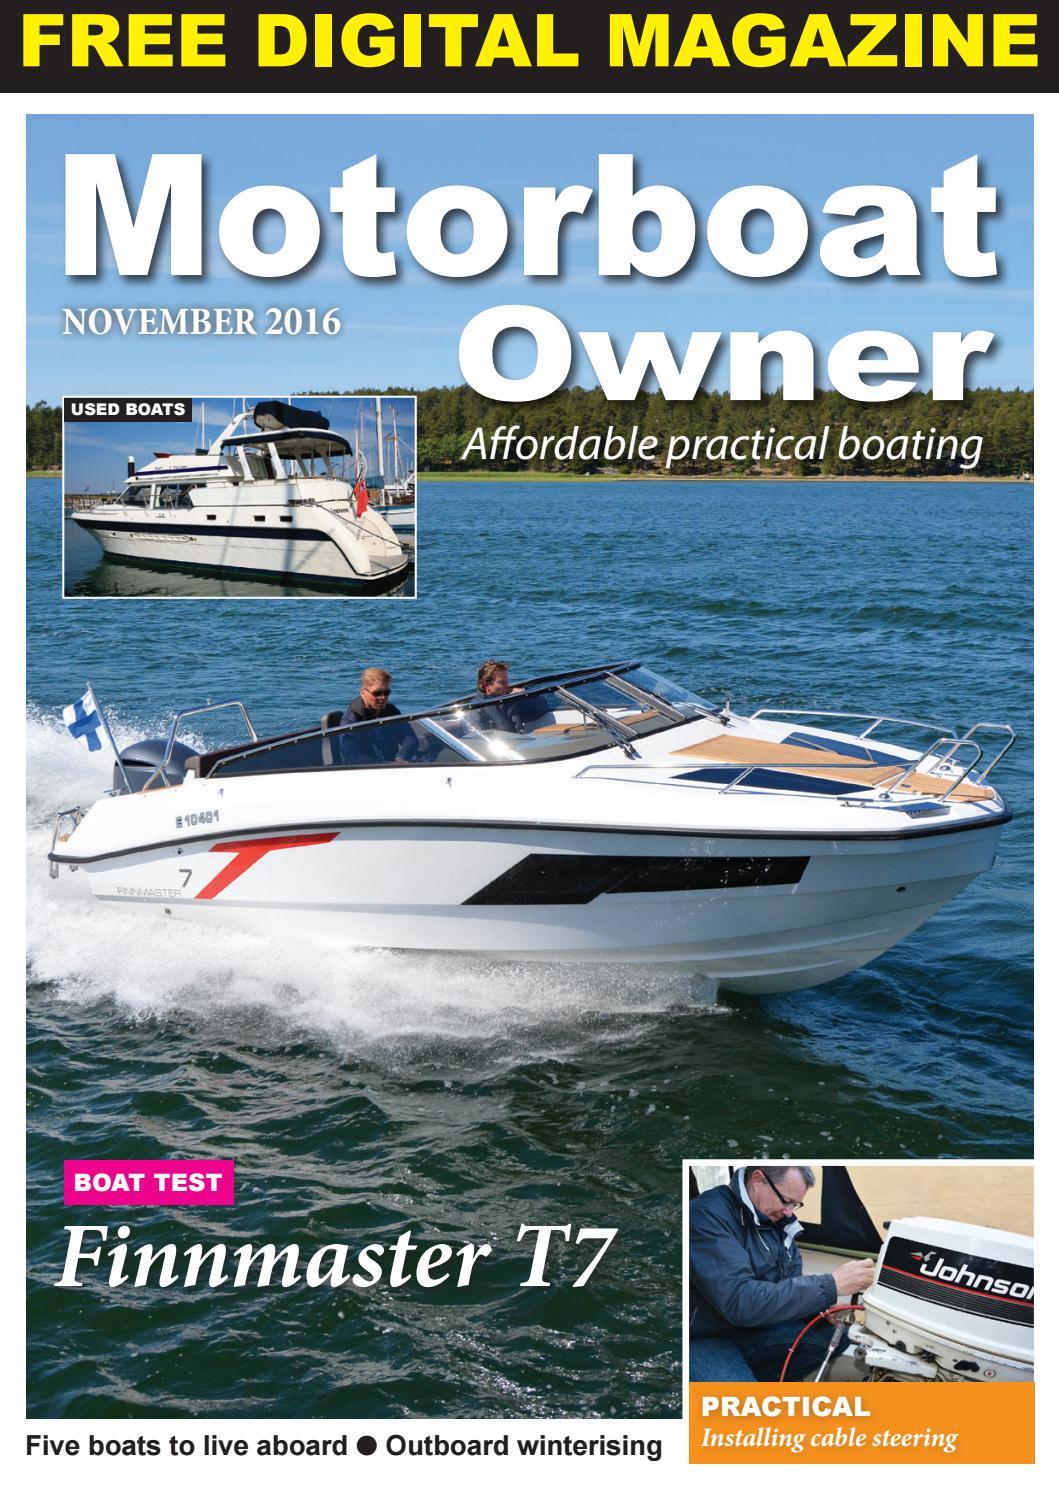 Motorboat Owner November 2016 by Digital Marine Media Ltd - issuu